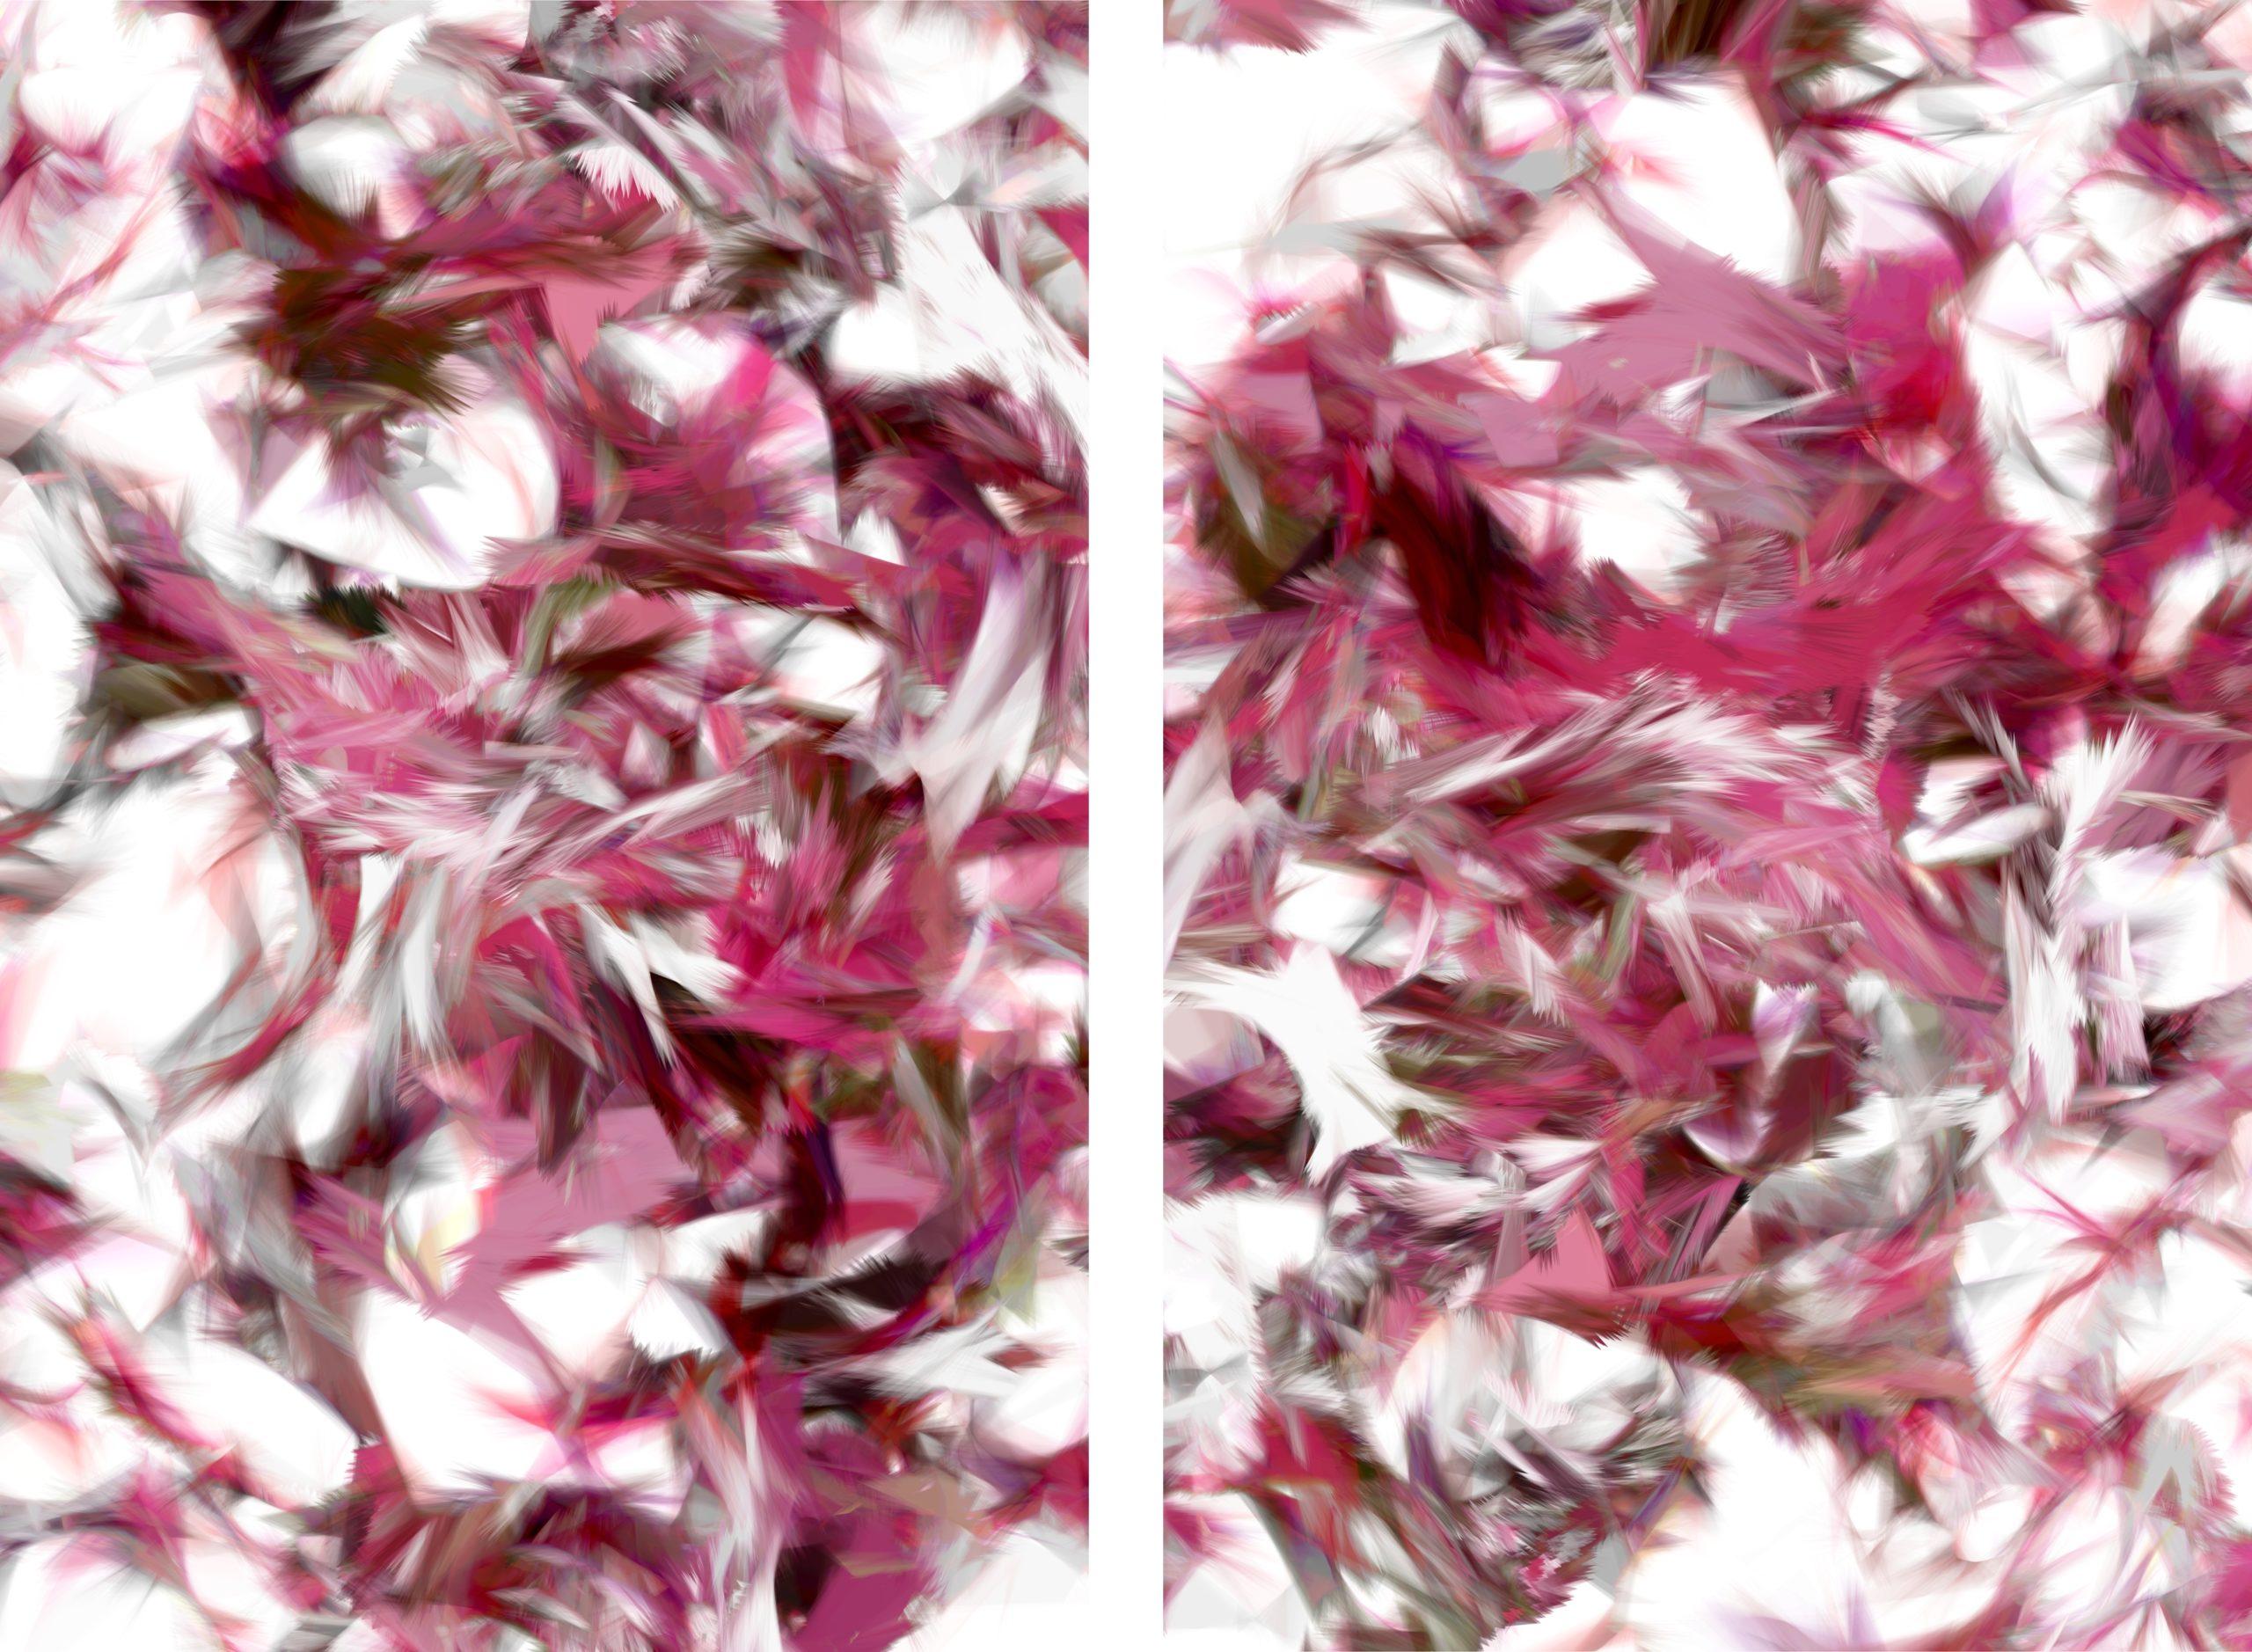 Casey Reas, Process 18 Image B3/4, C-Print auf Aluminium, Diptych, je 45 x 30 cm, 2010